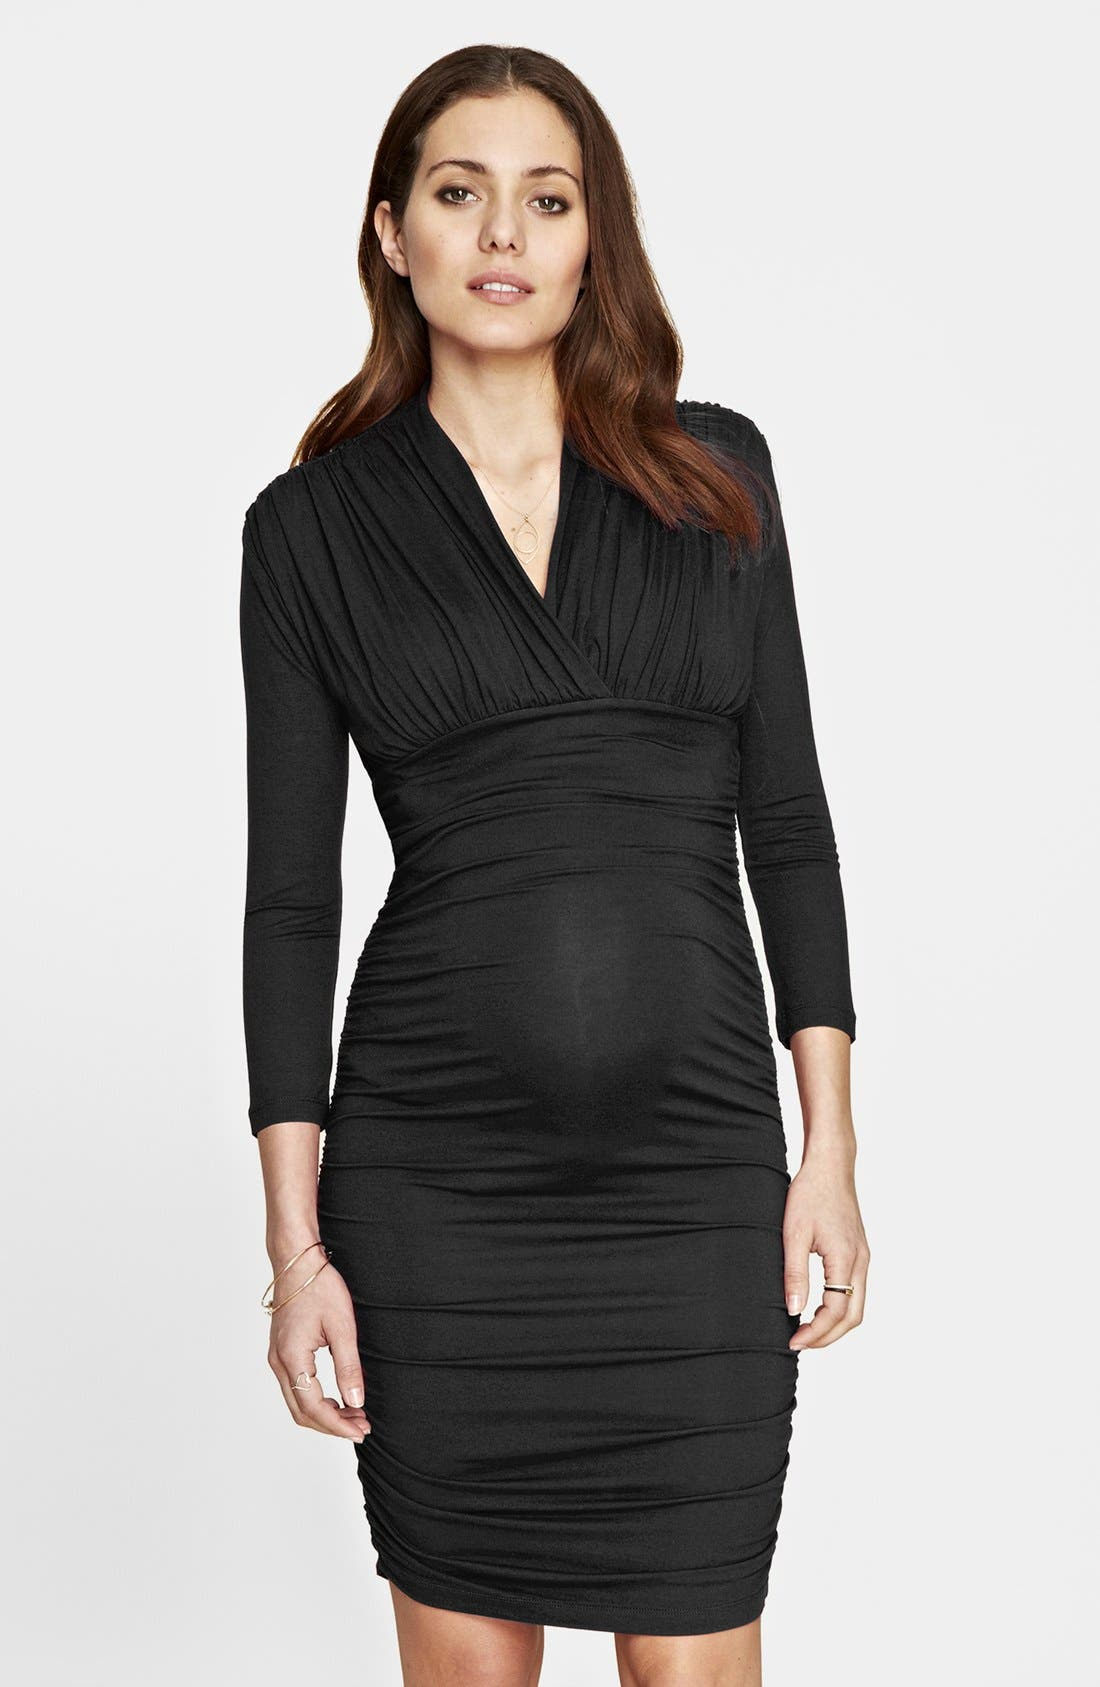 Alternate Image 1 Selected - Isabella Oliver 'Olivia' Maternity Dress